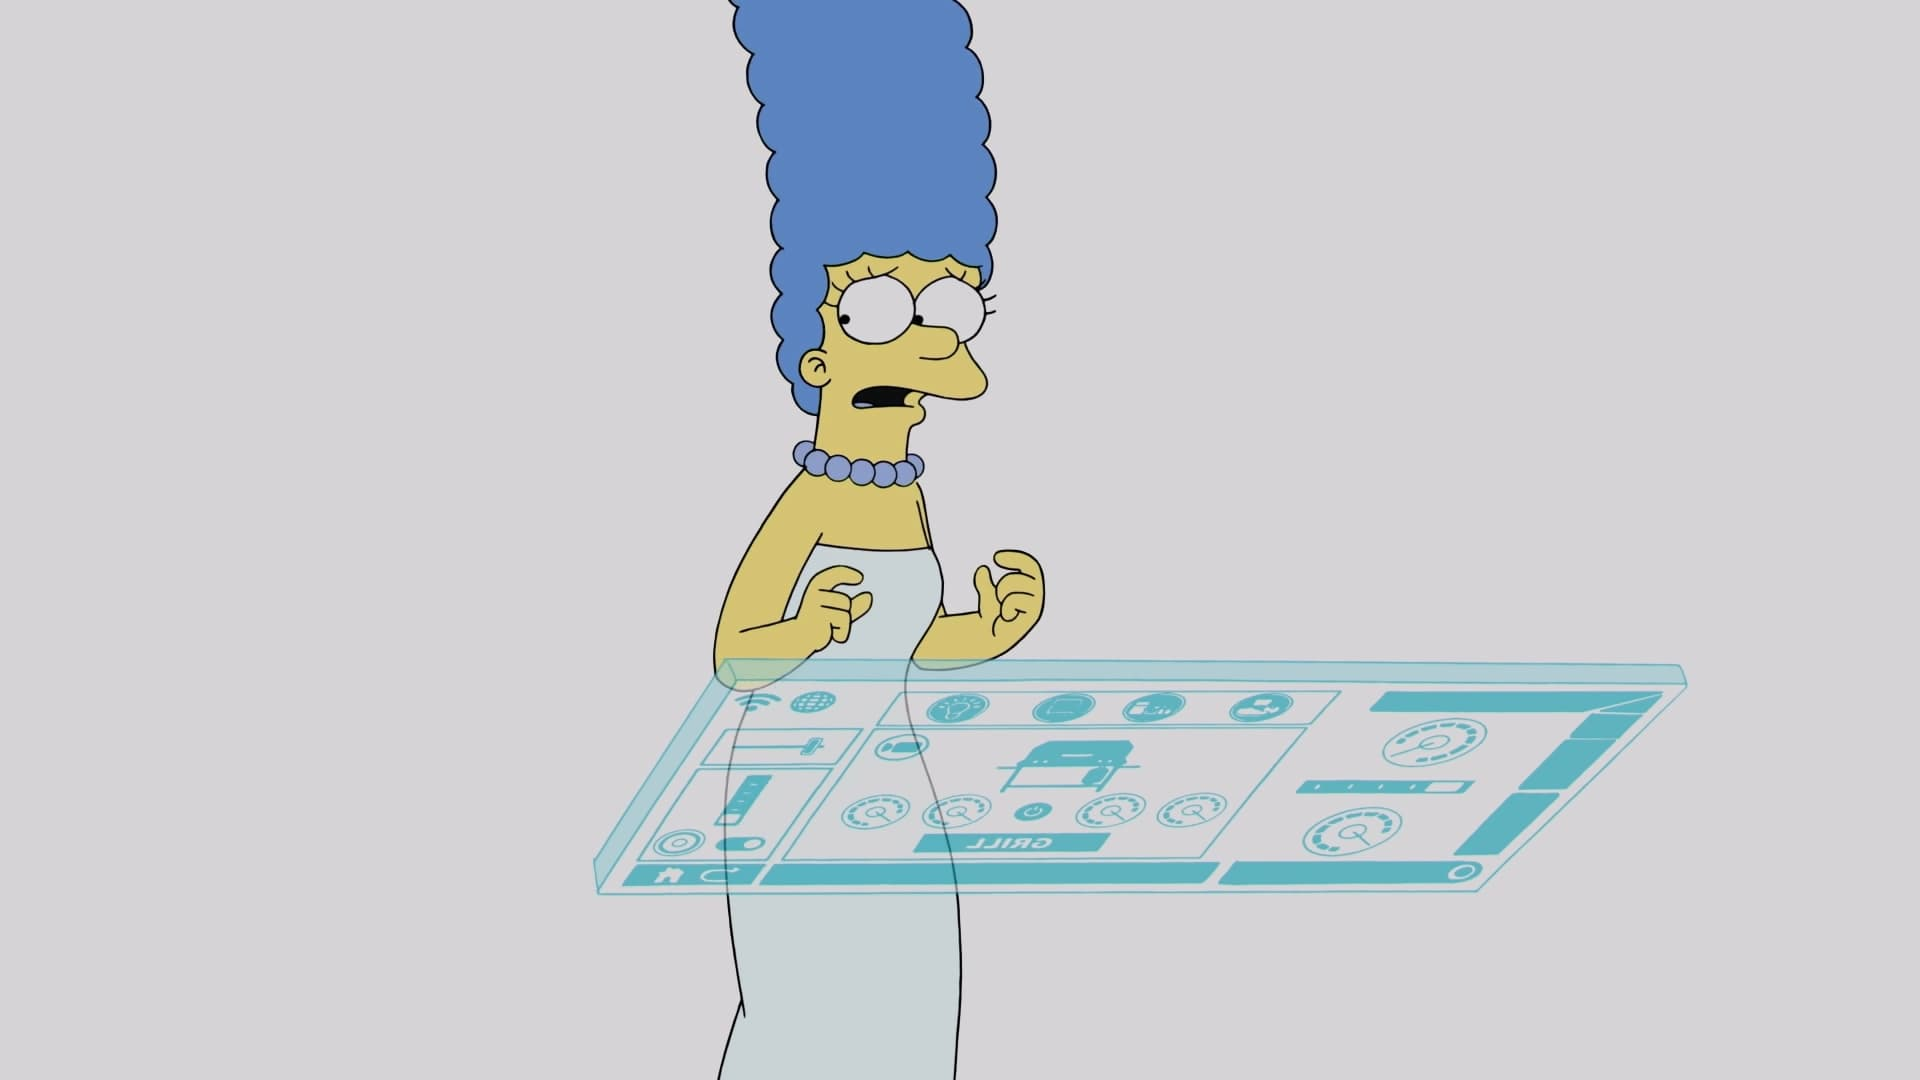 The Simpsons - Season 31 Episode 8 : Thanksgiving of horror